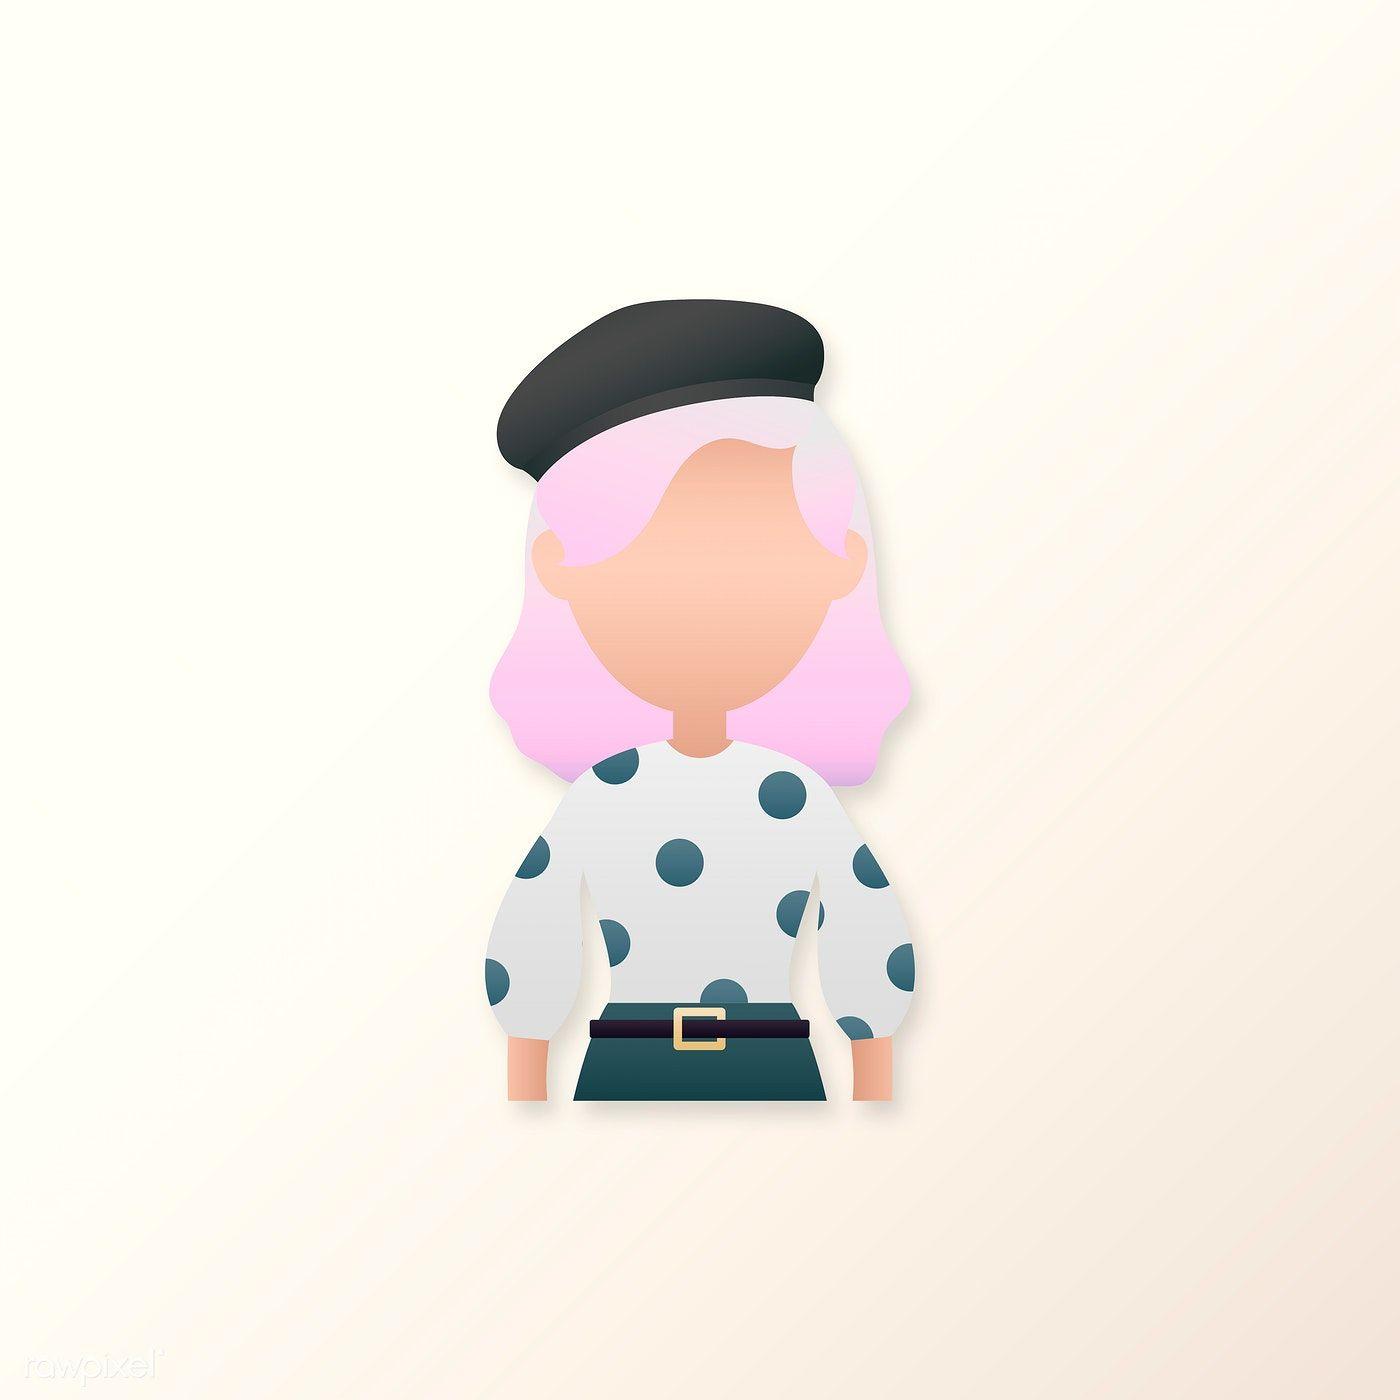 Download premium vector of Woman in polka dot dress avatar vector 2024269